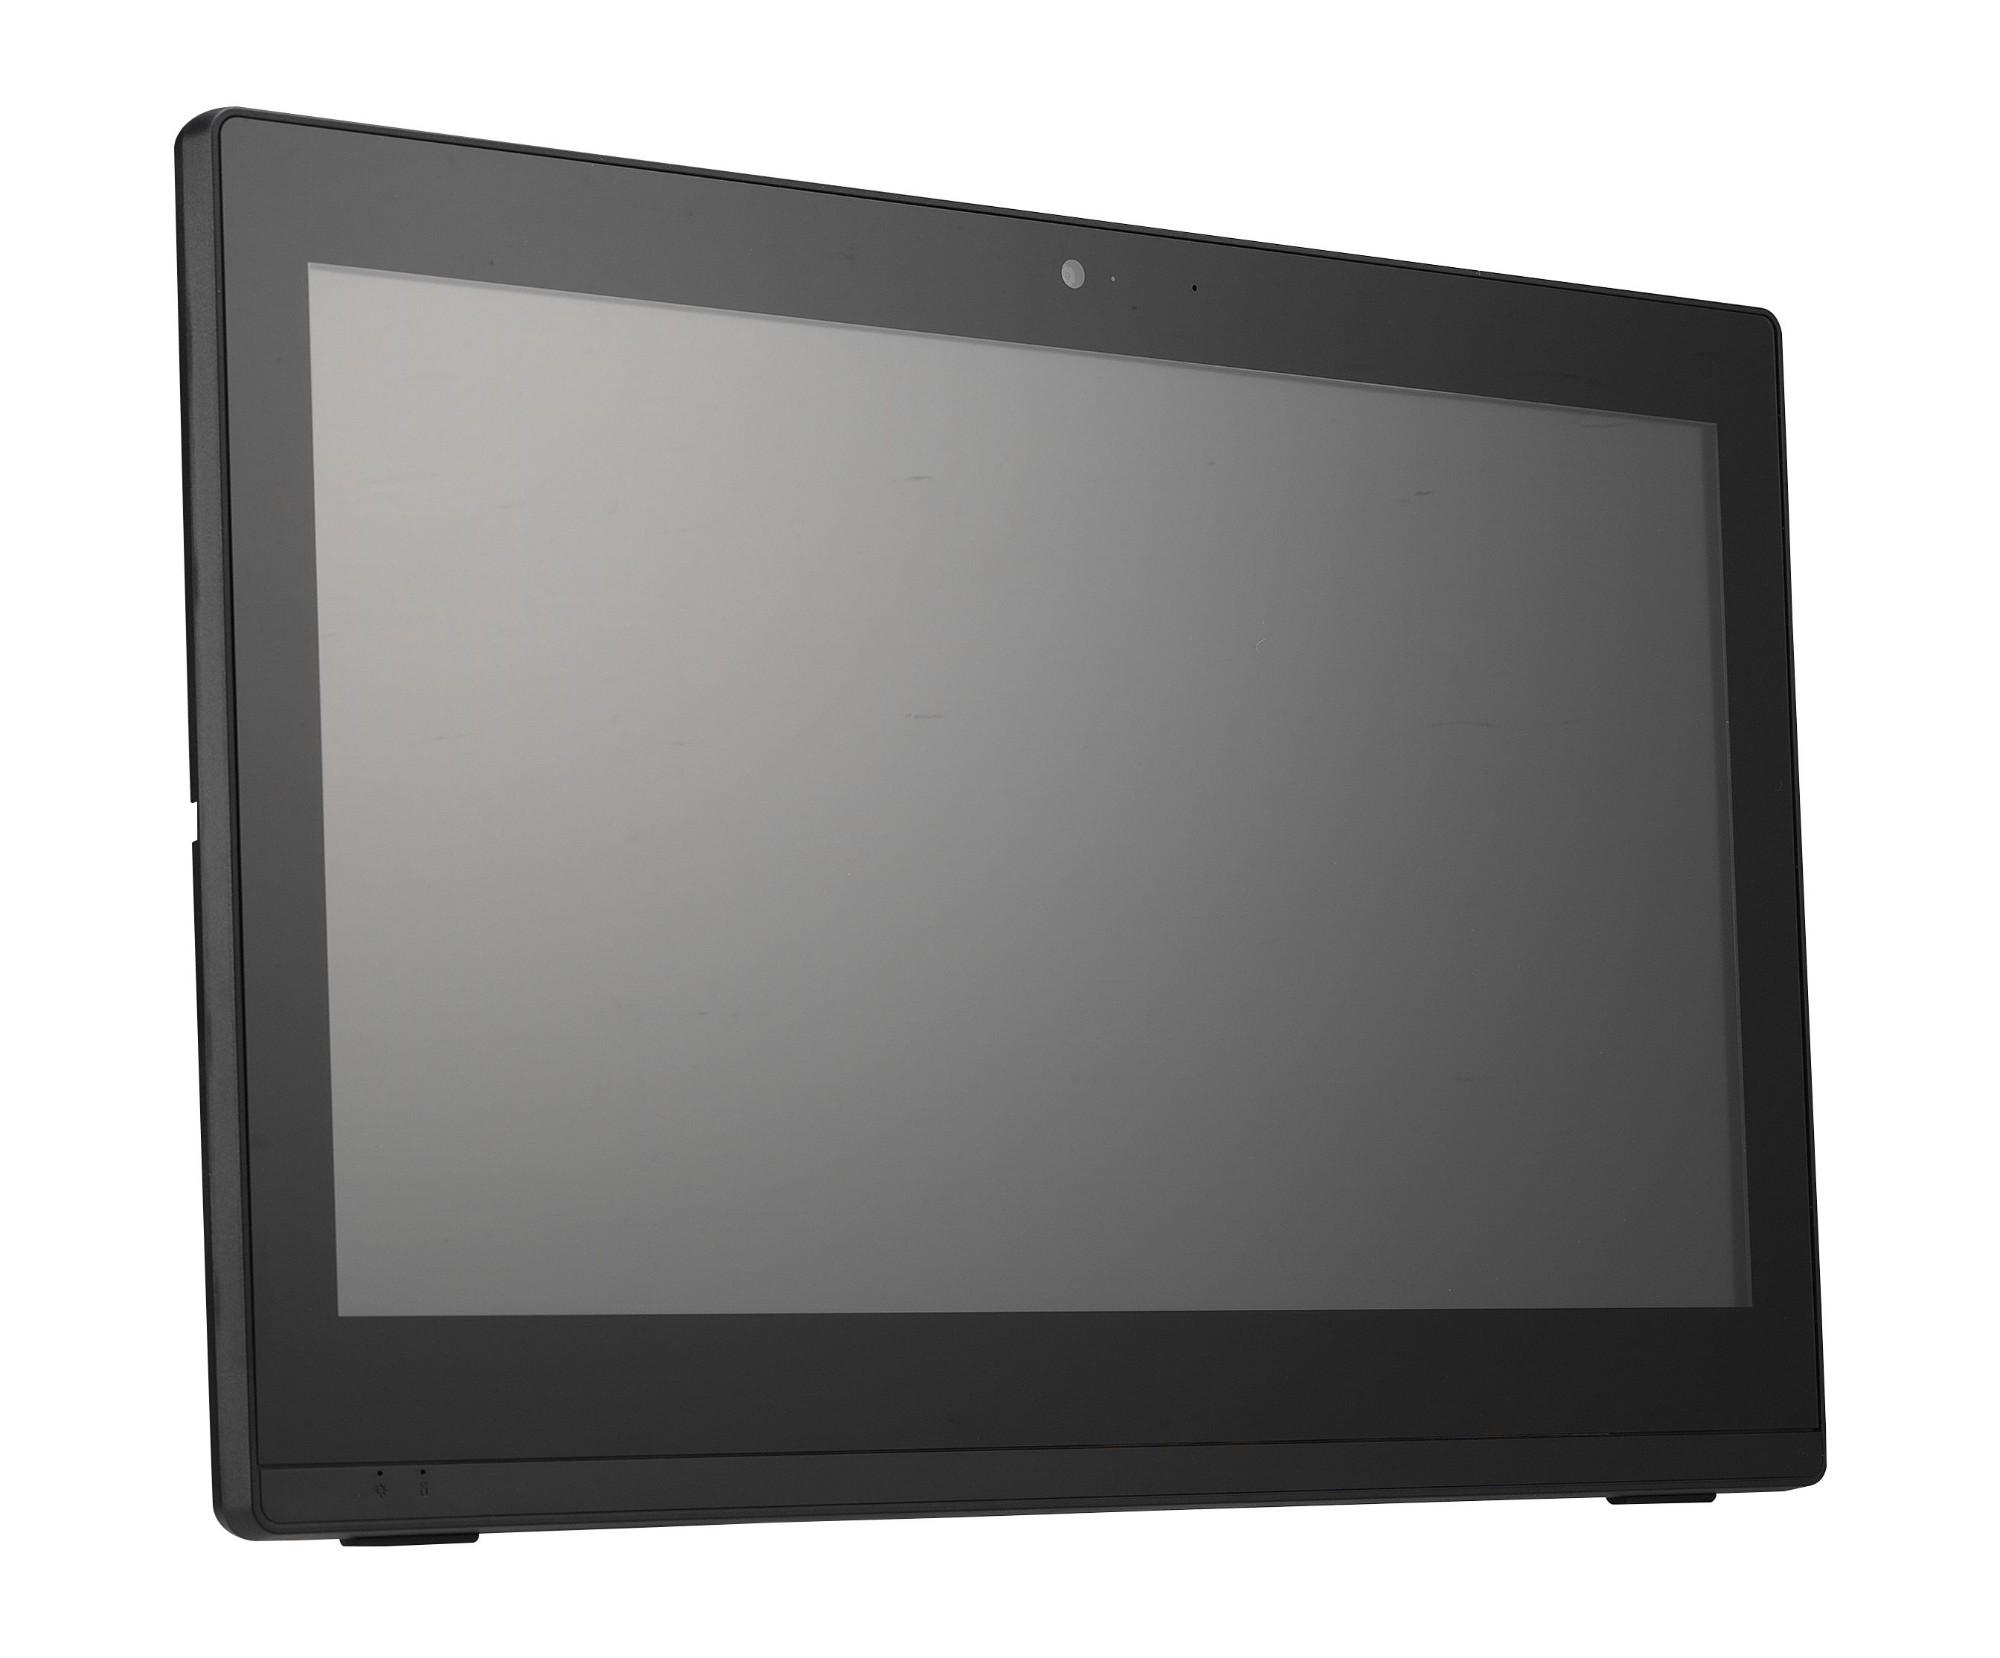 Shuttle XPC all-in-one P90U5 i5-7200U 2.50 GHz Black Intel SoC BGA 1356